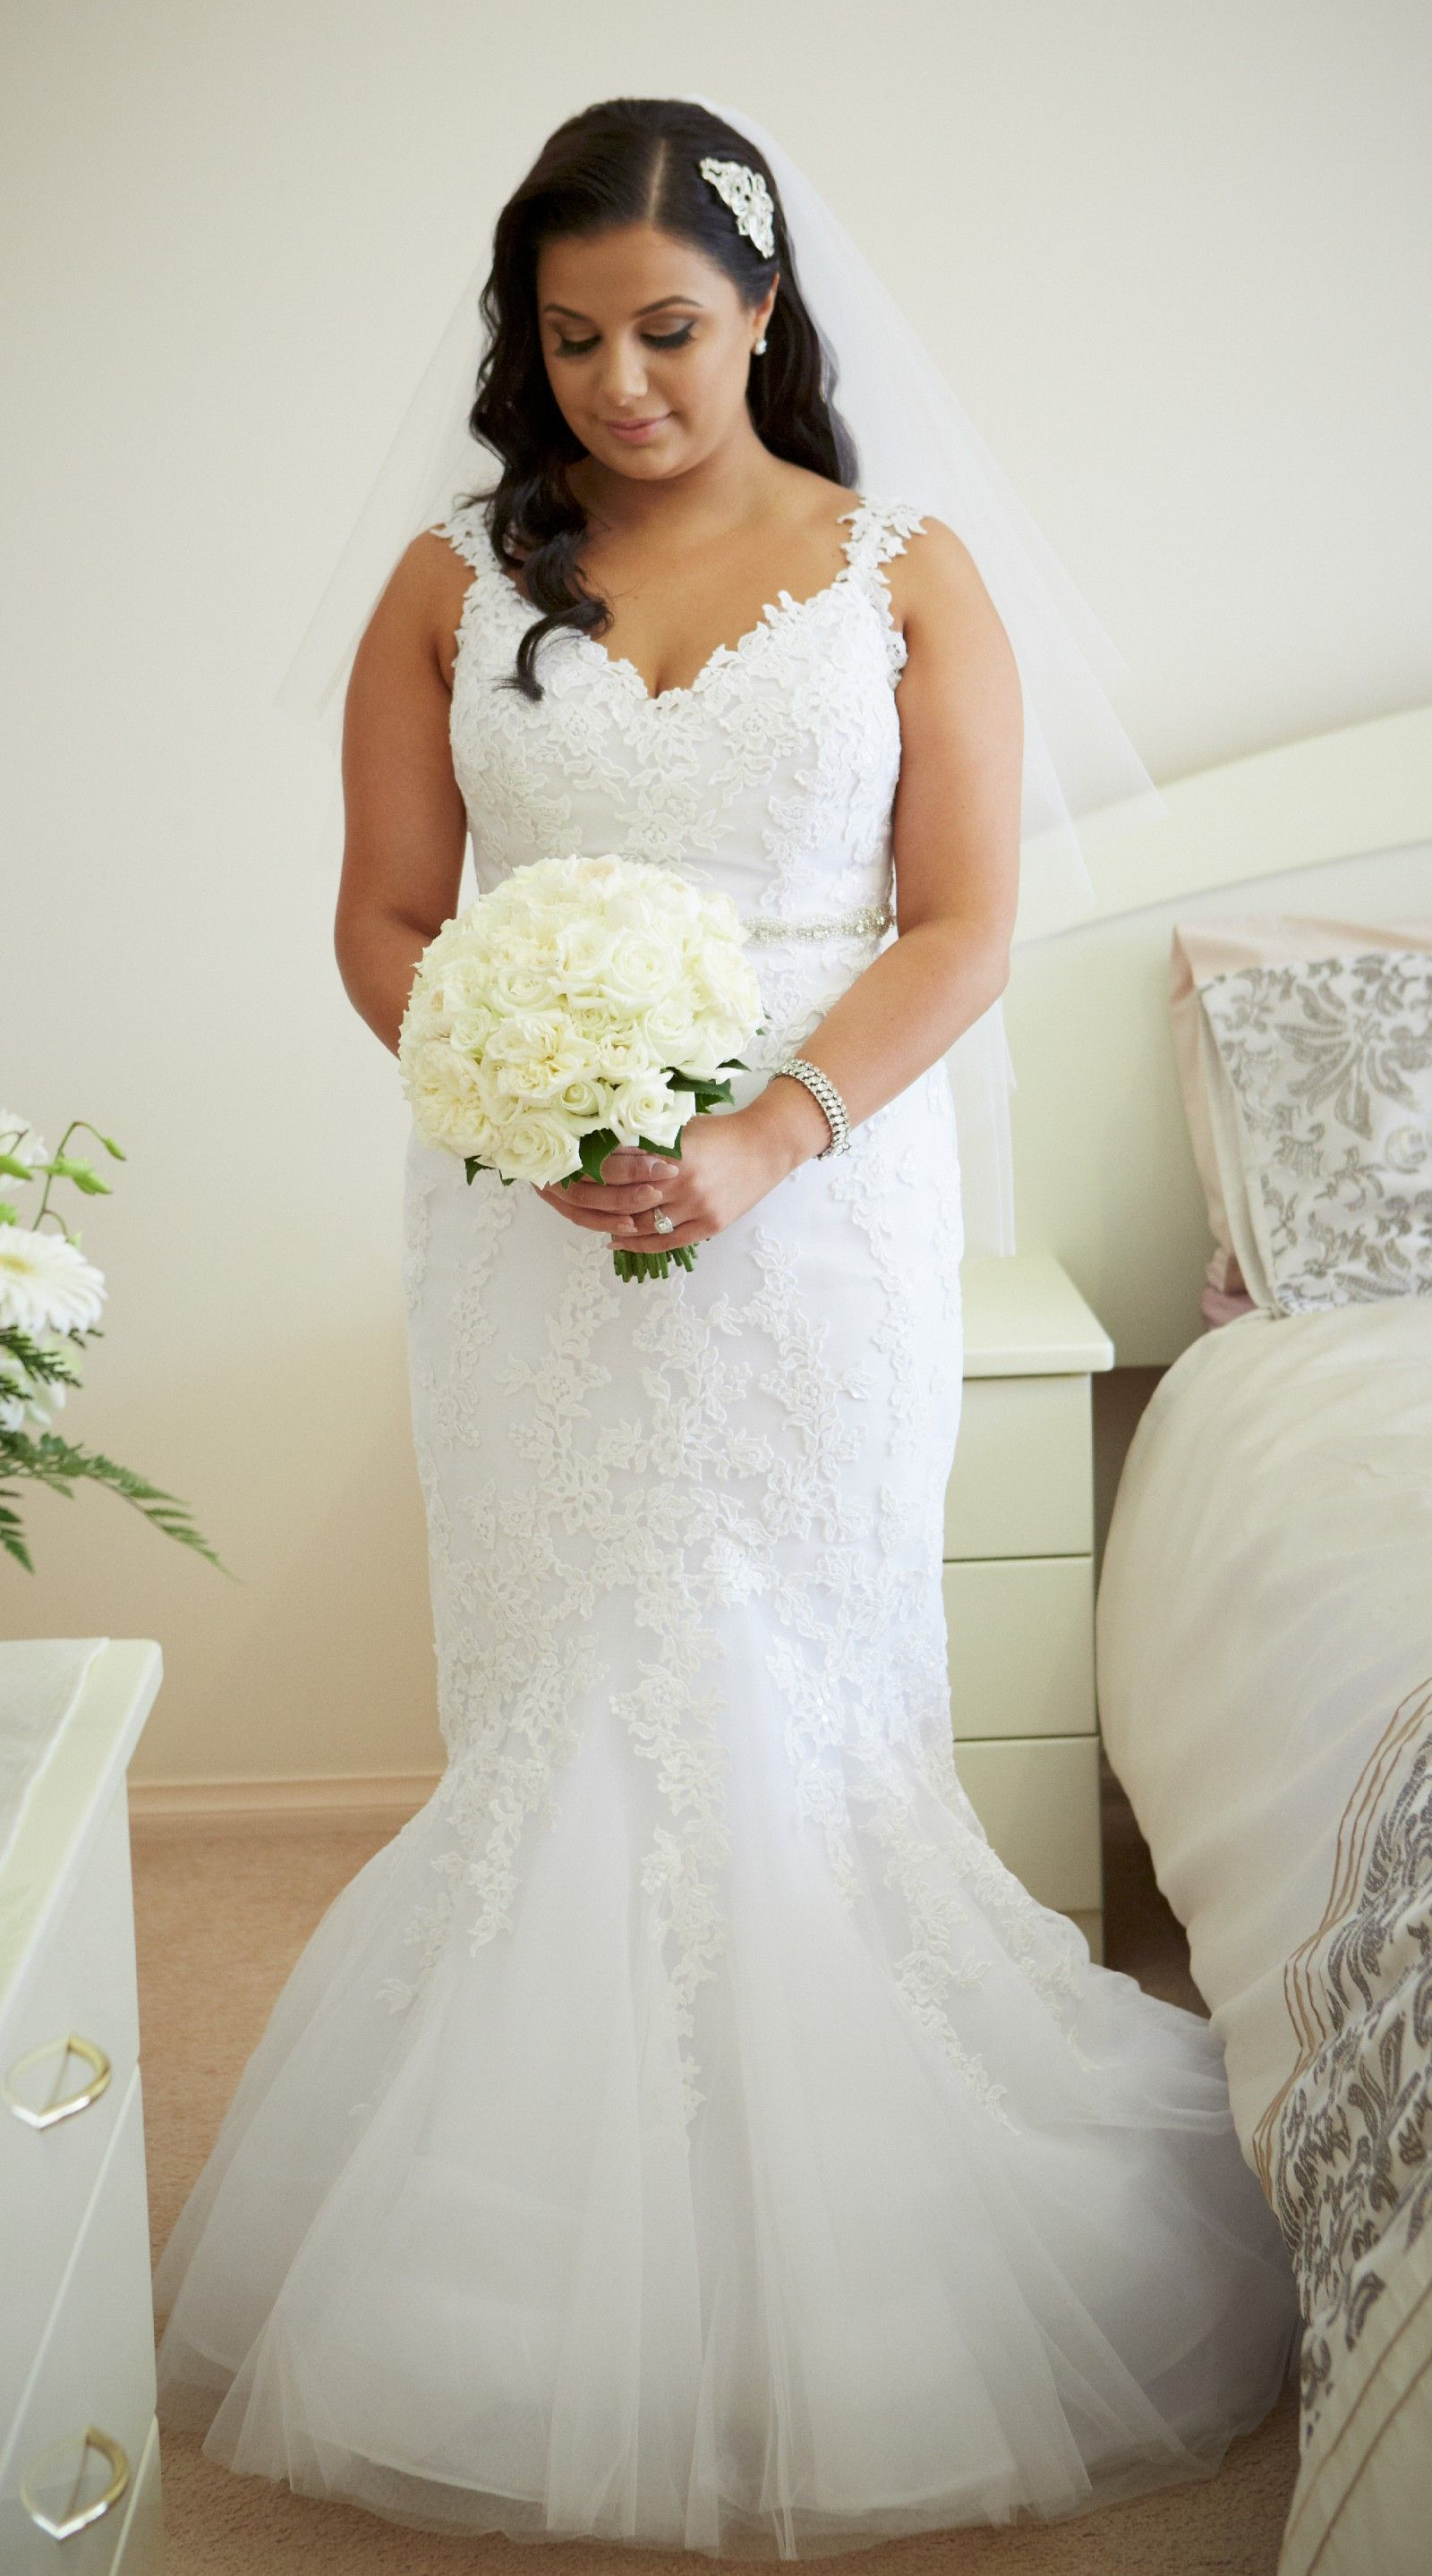 Handmade wedding dress  Custom Wedding Dresses  Made To Measure by Darius Bridal  Custom